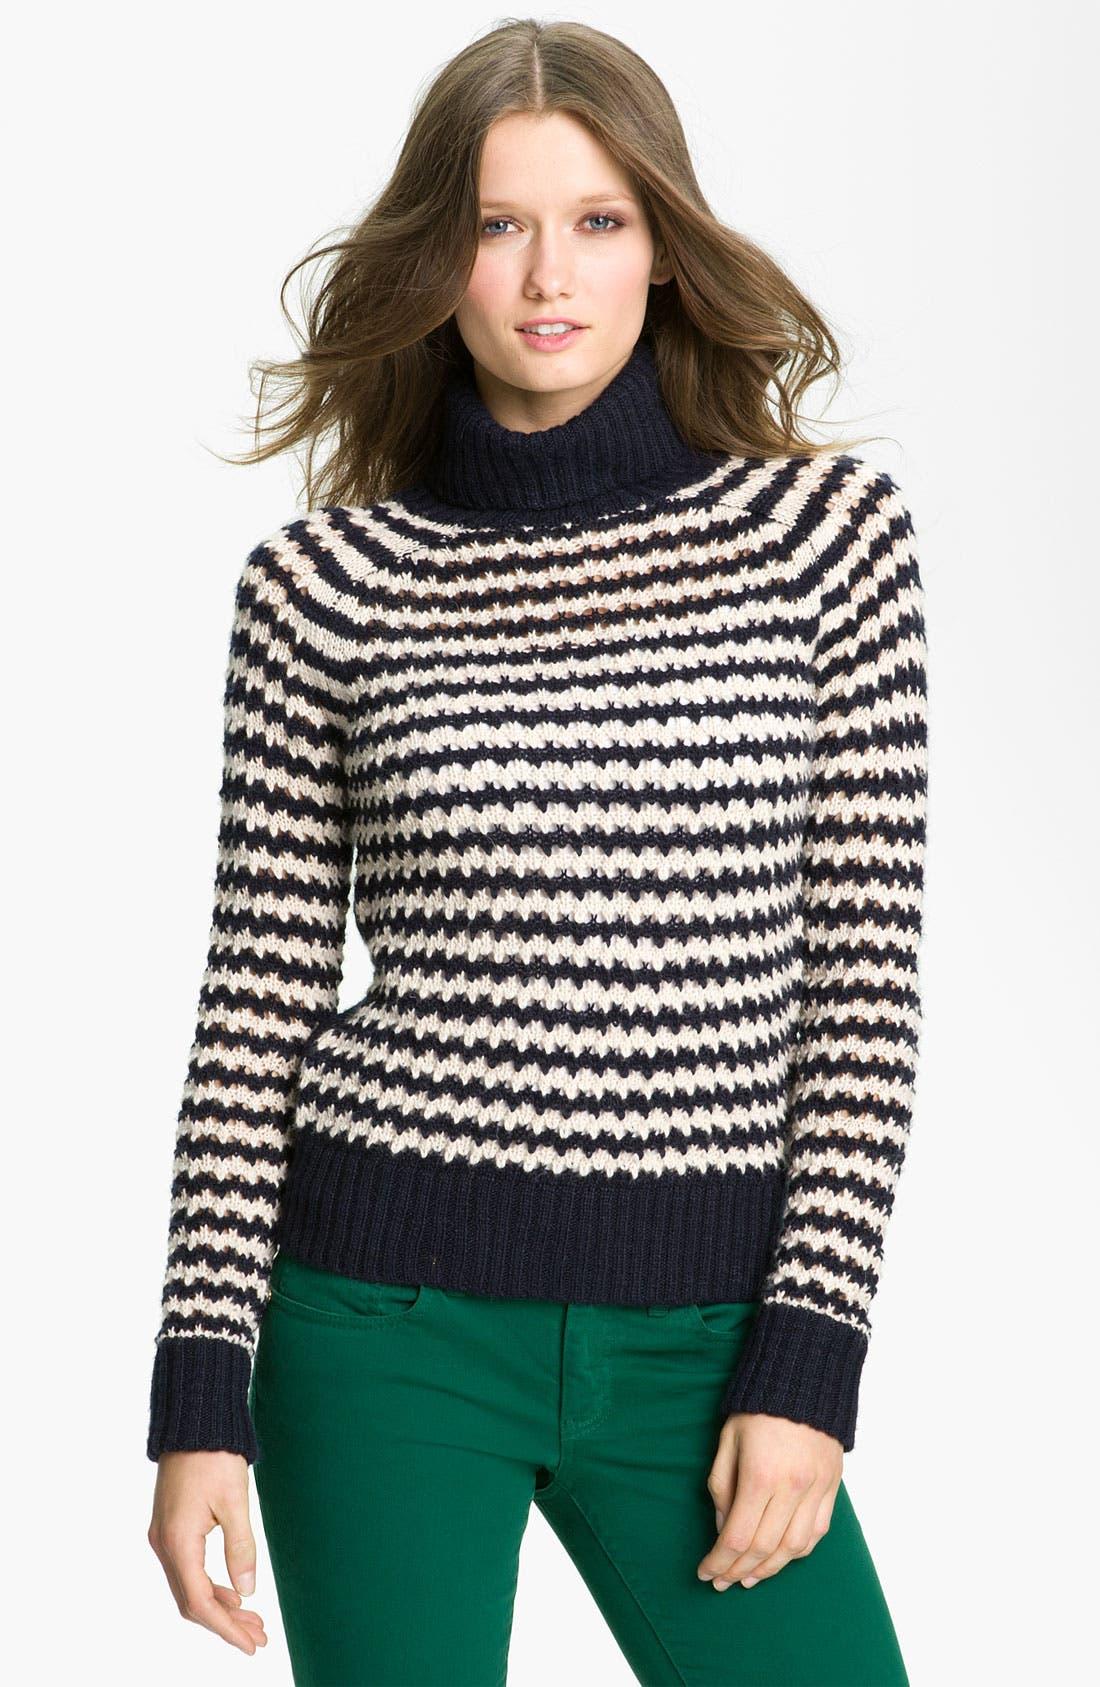 Main Image - Tory Burch 'Carey' Turtleneck Sweater